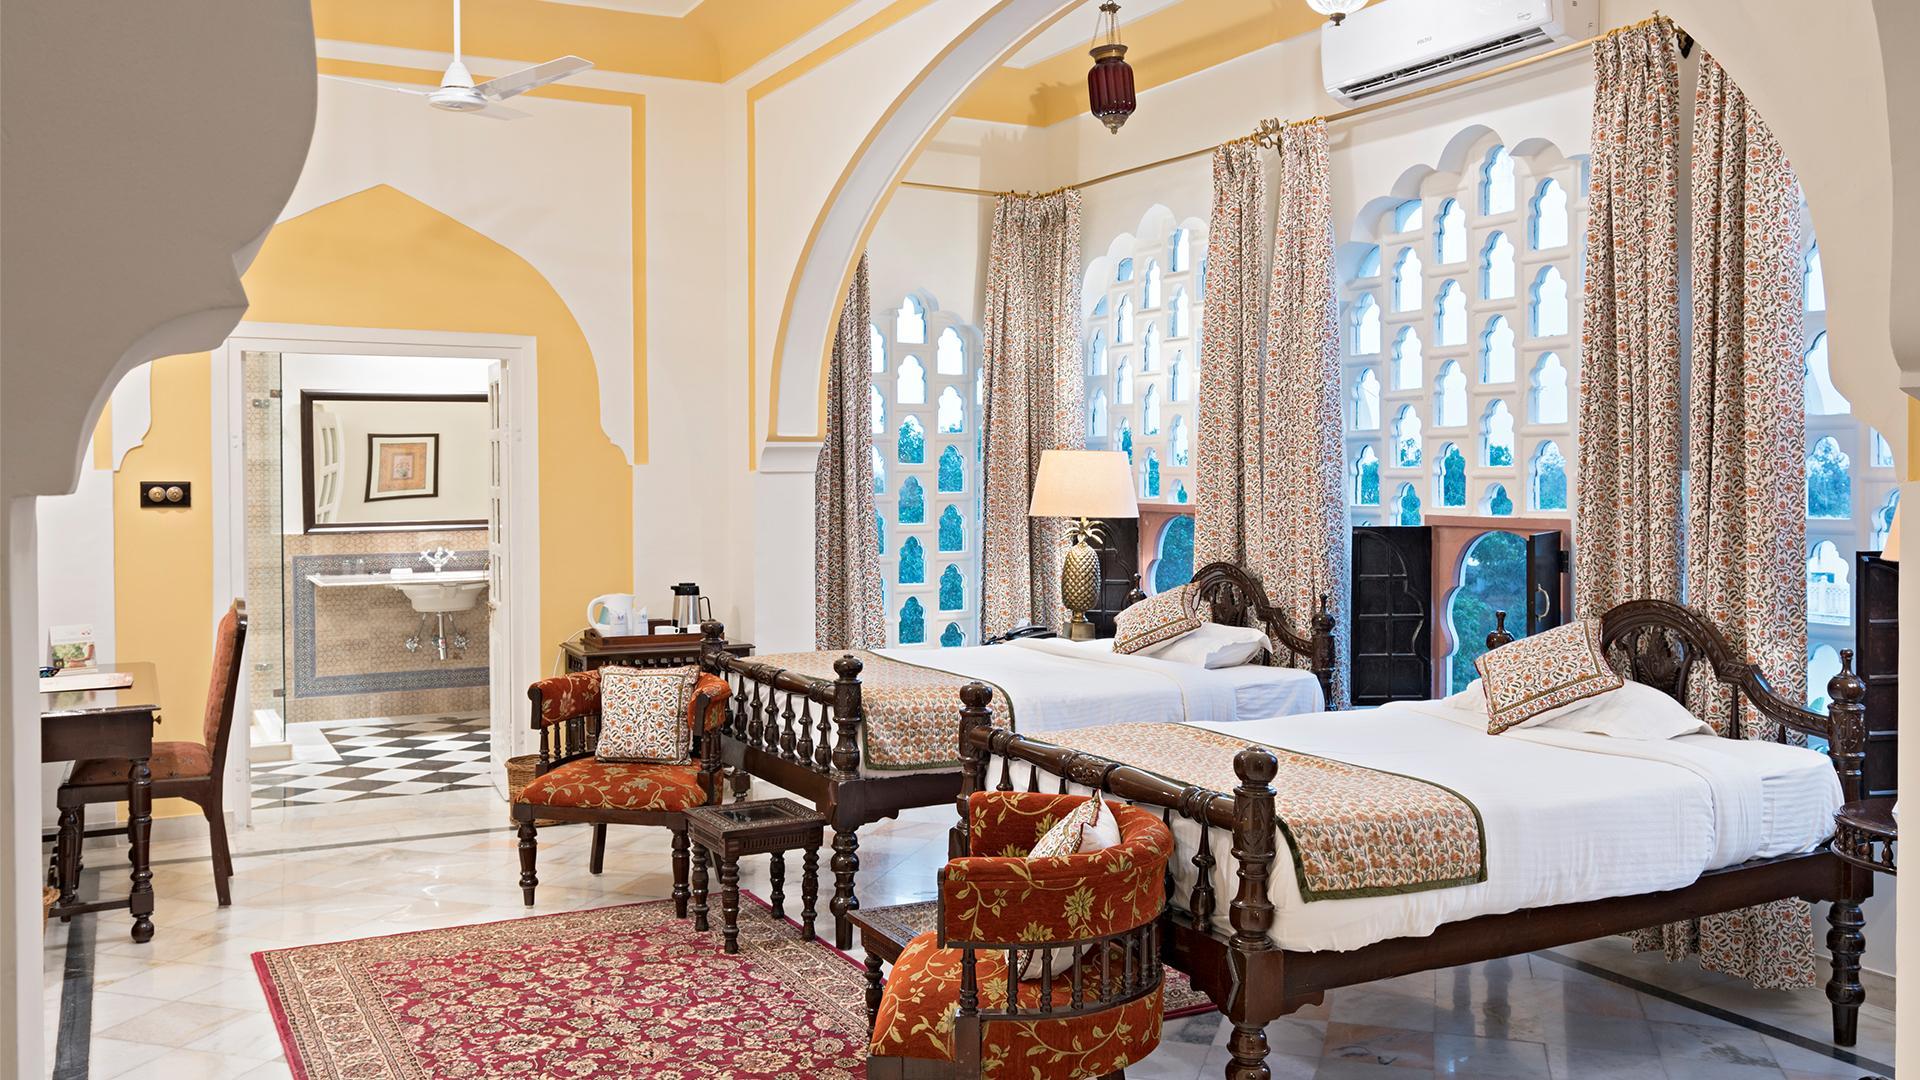 Deluxe Room image 1 at Nahargarh Ranthambhore by Sawai Madhopur, Rajasthan, India